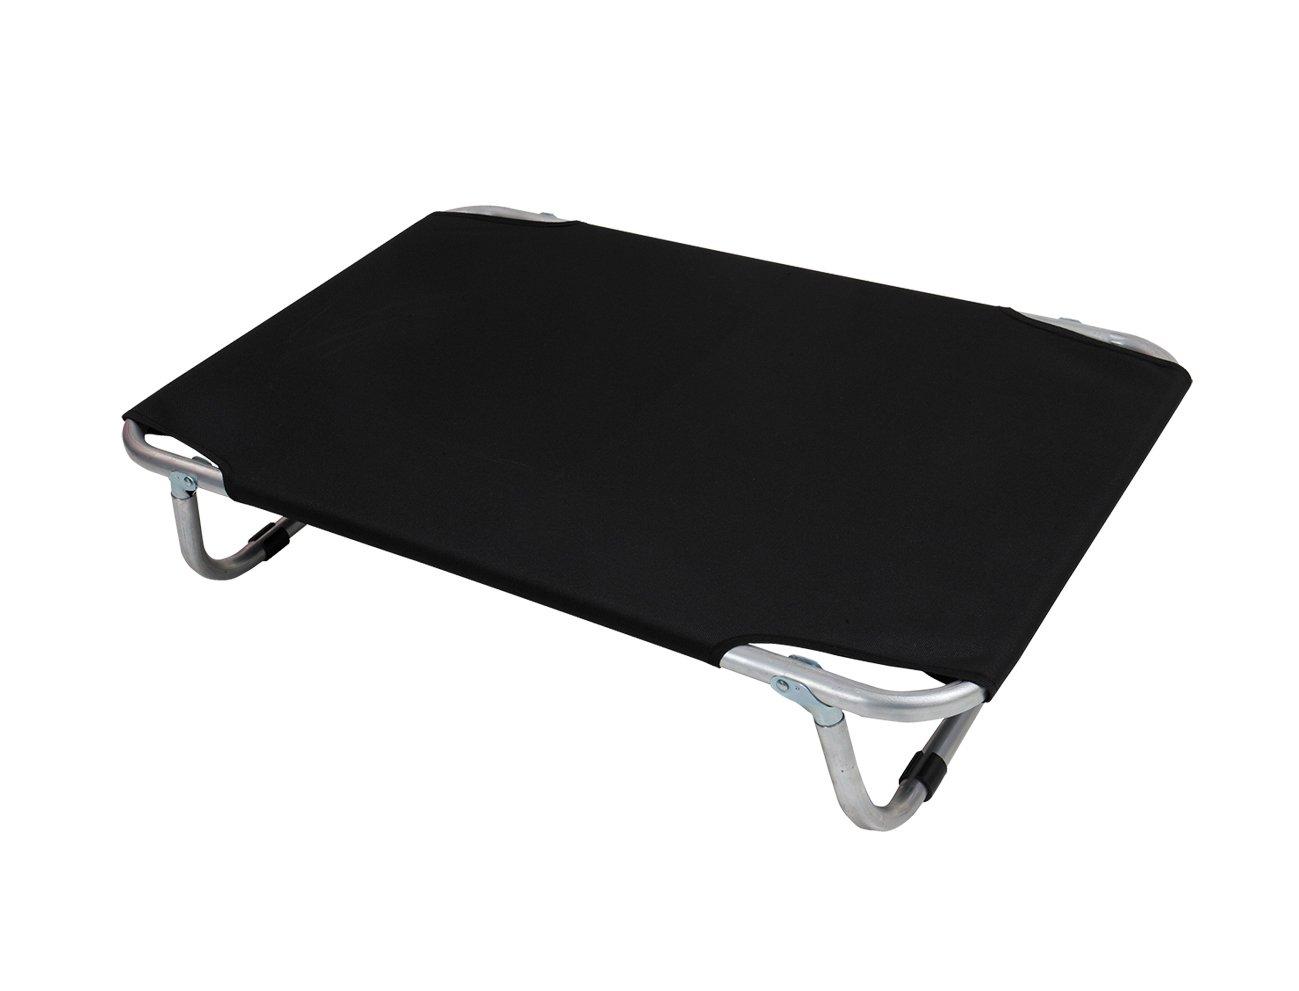 VADIGRAN Aluminium Dog Bed, 80 x 50 cm, Black